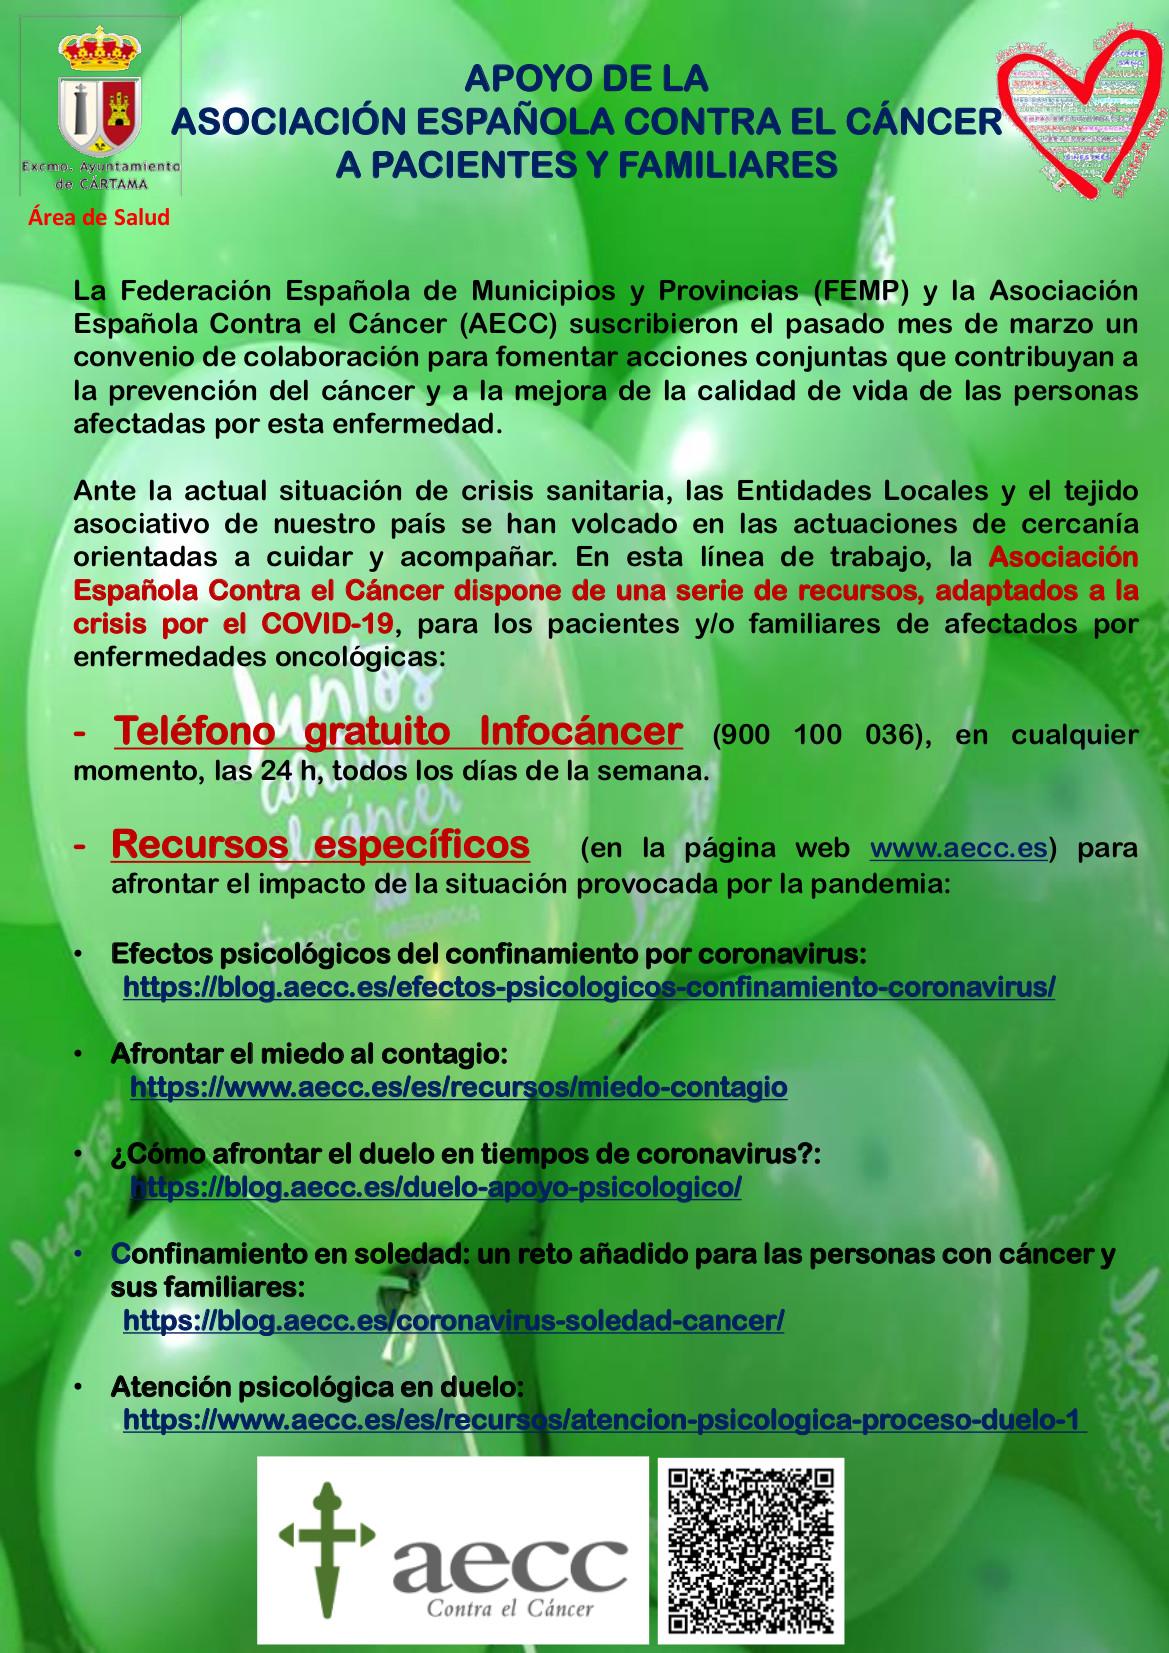 cartel-apoyo-aecc-crisis-coronavirus-210520